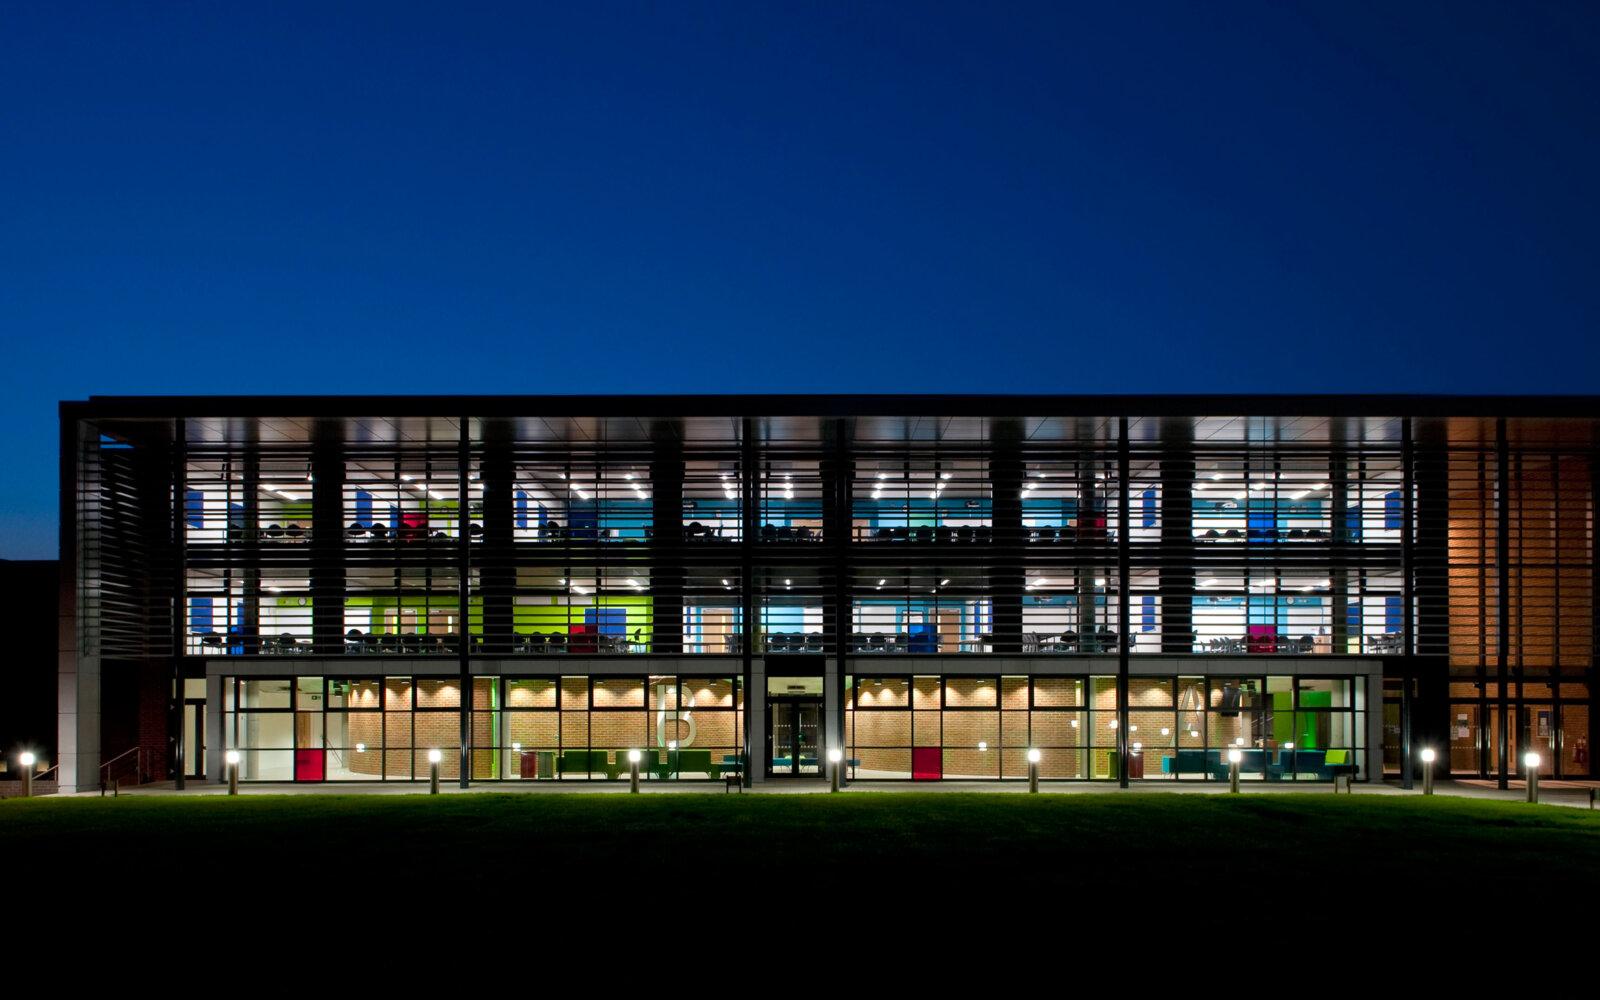 University of Sussex at night